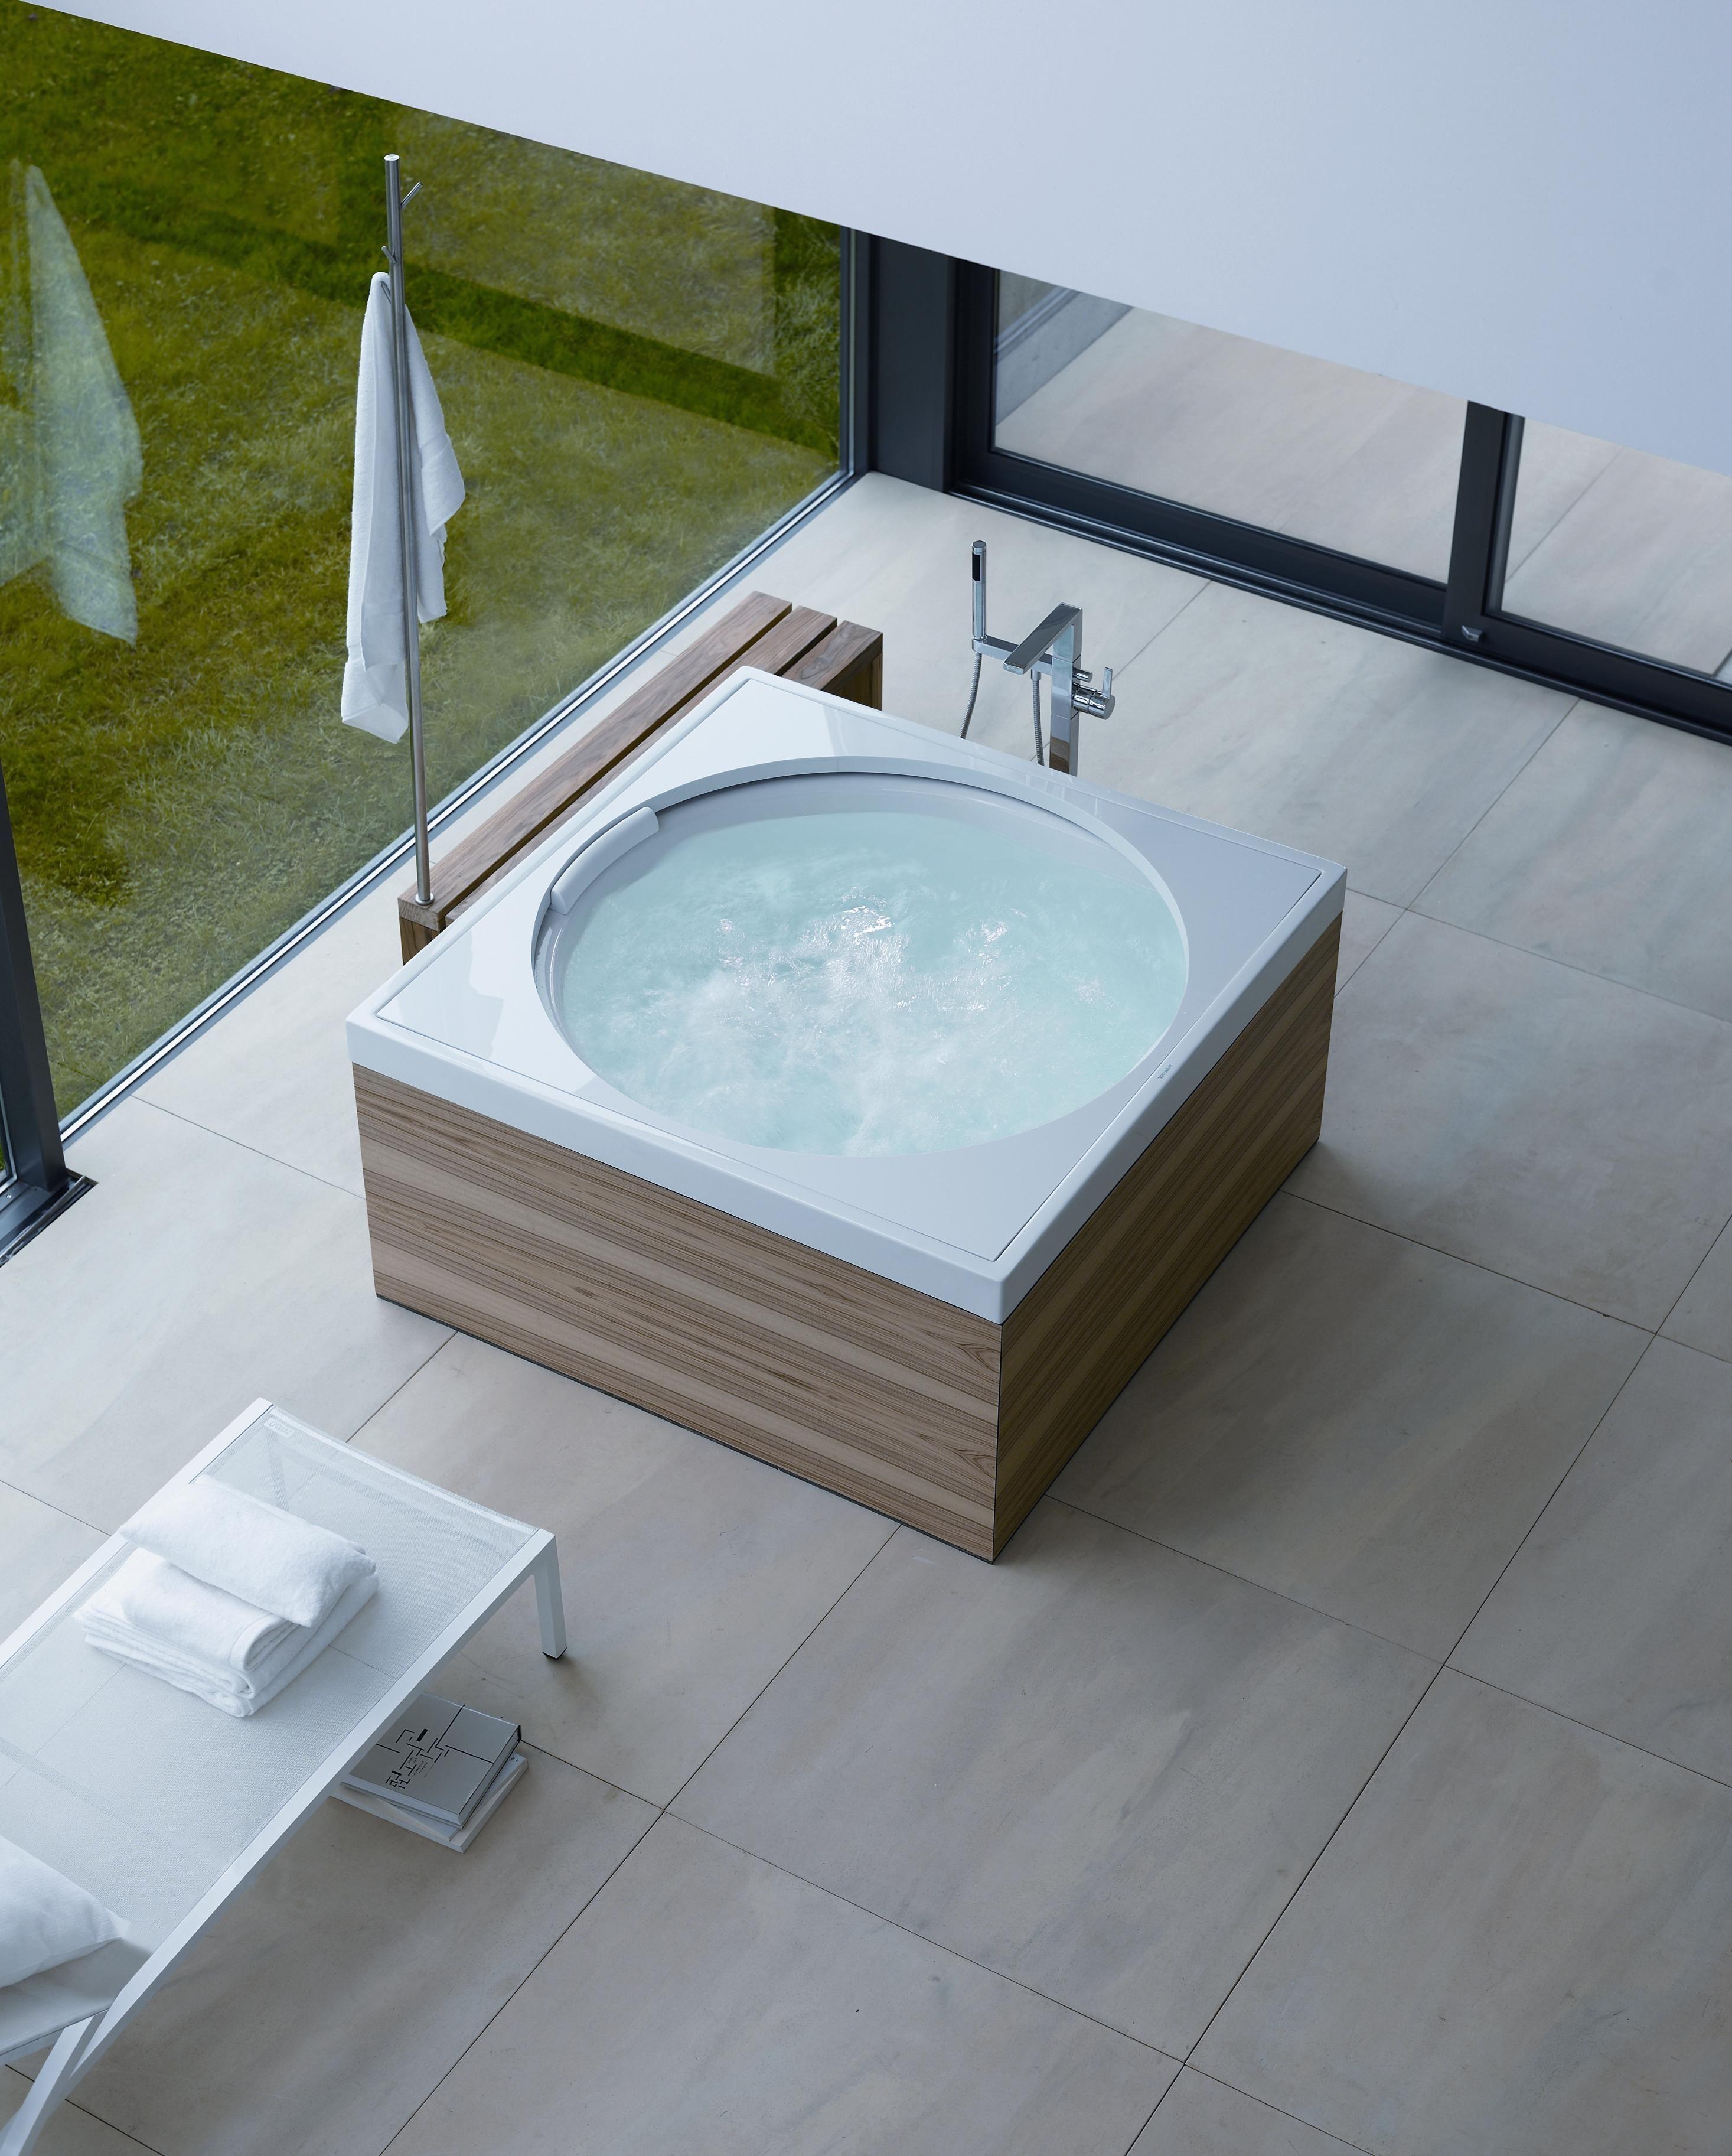 Lunar Inspired Bathtubs Interiors Amp Architecture